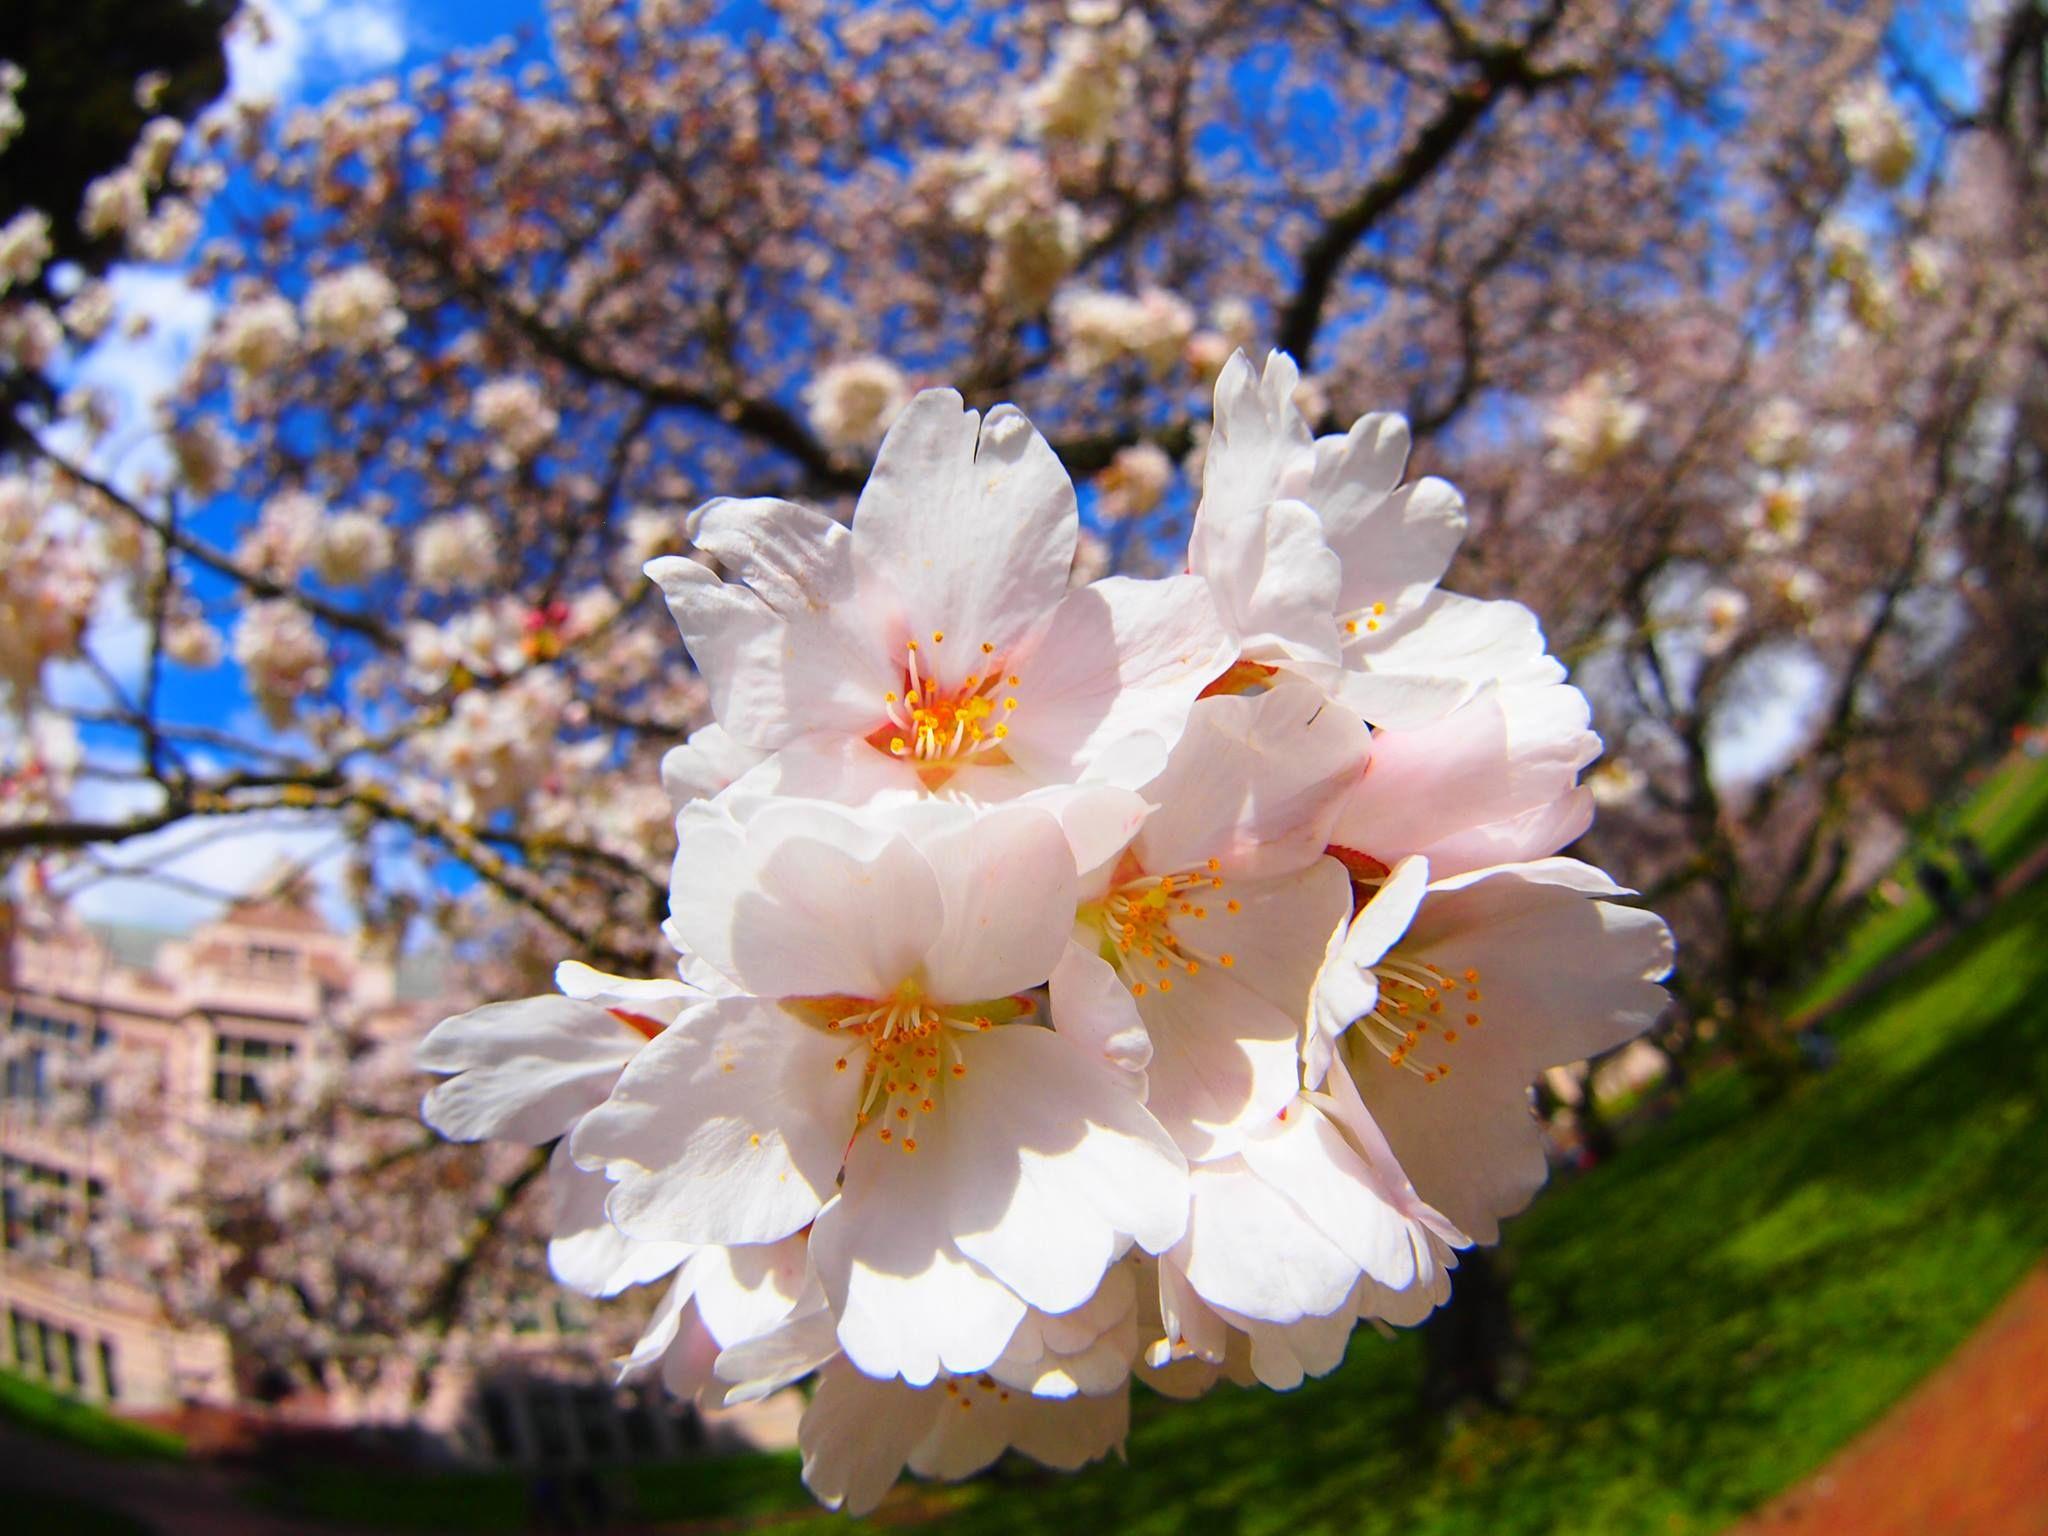 Uw Cherry Blossoms Spring 2014 Photo By Nirupam Nigam Cherry Blossom Blossom Spring 2014